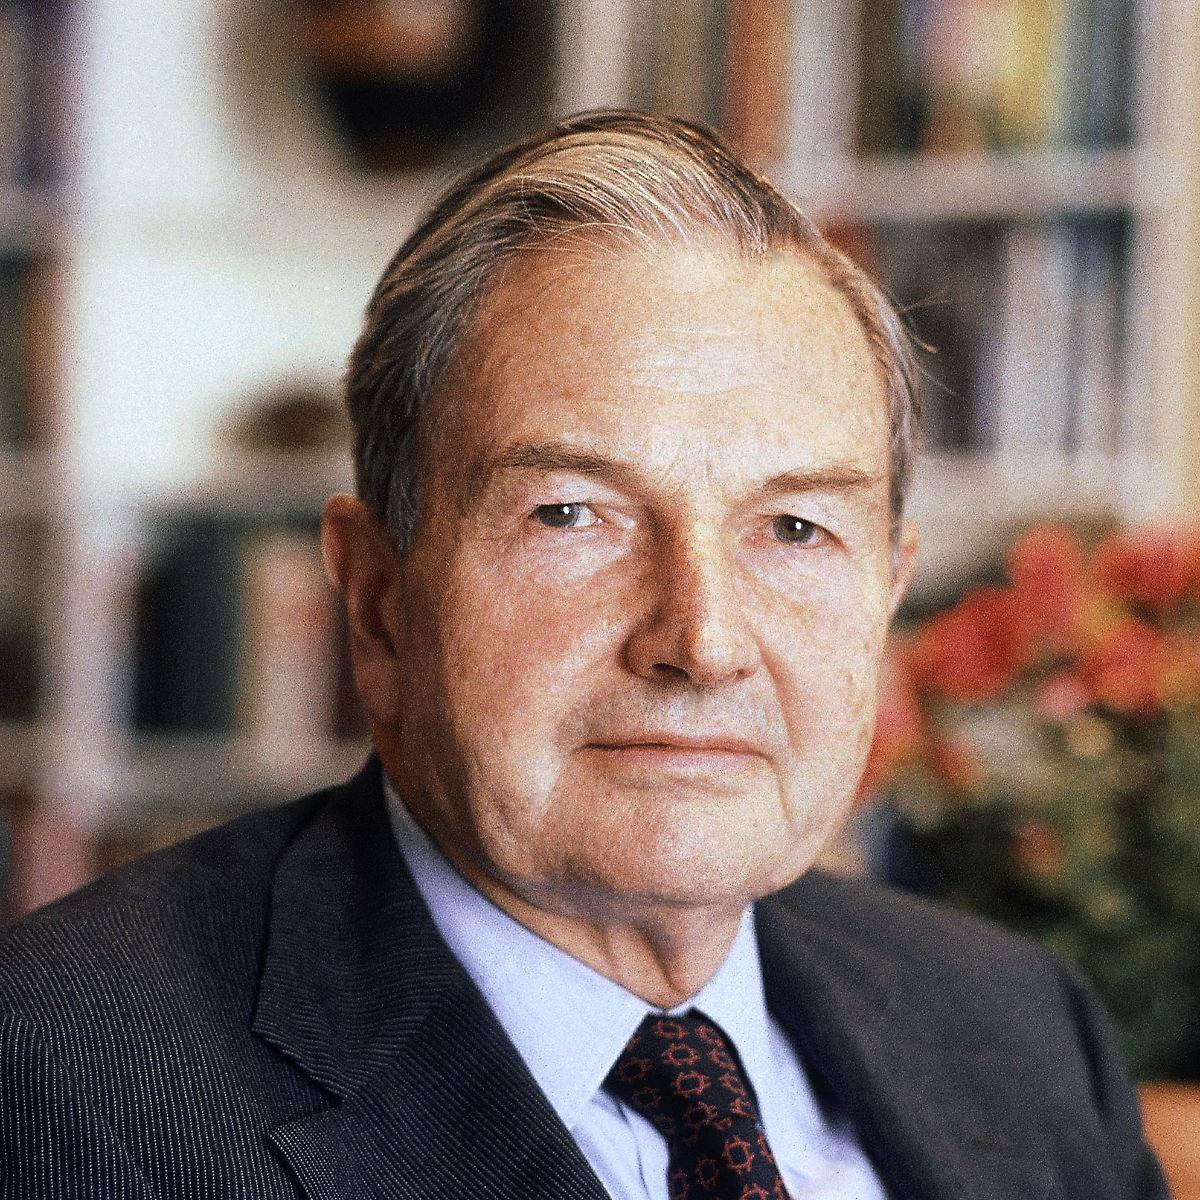 Ältester Milliardär der Welt Letzter Rockefeller Enkel ist tot ...